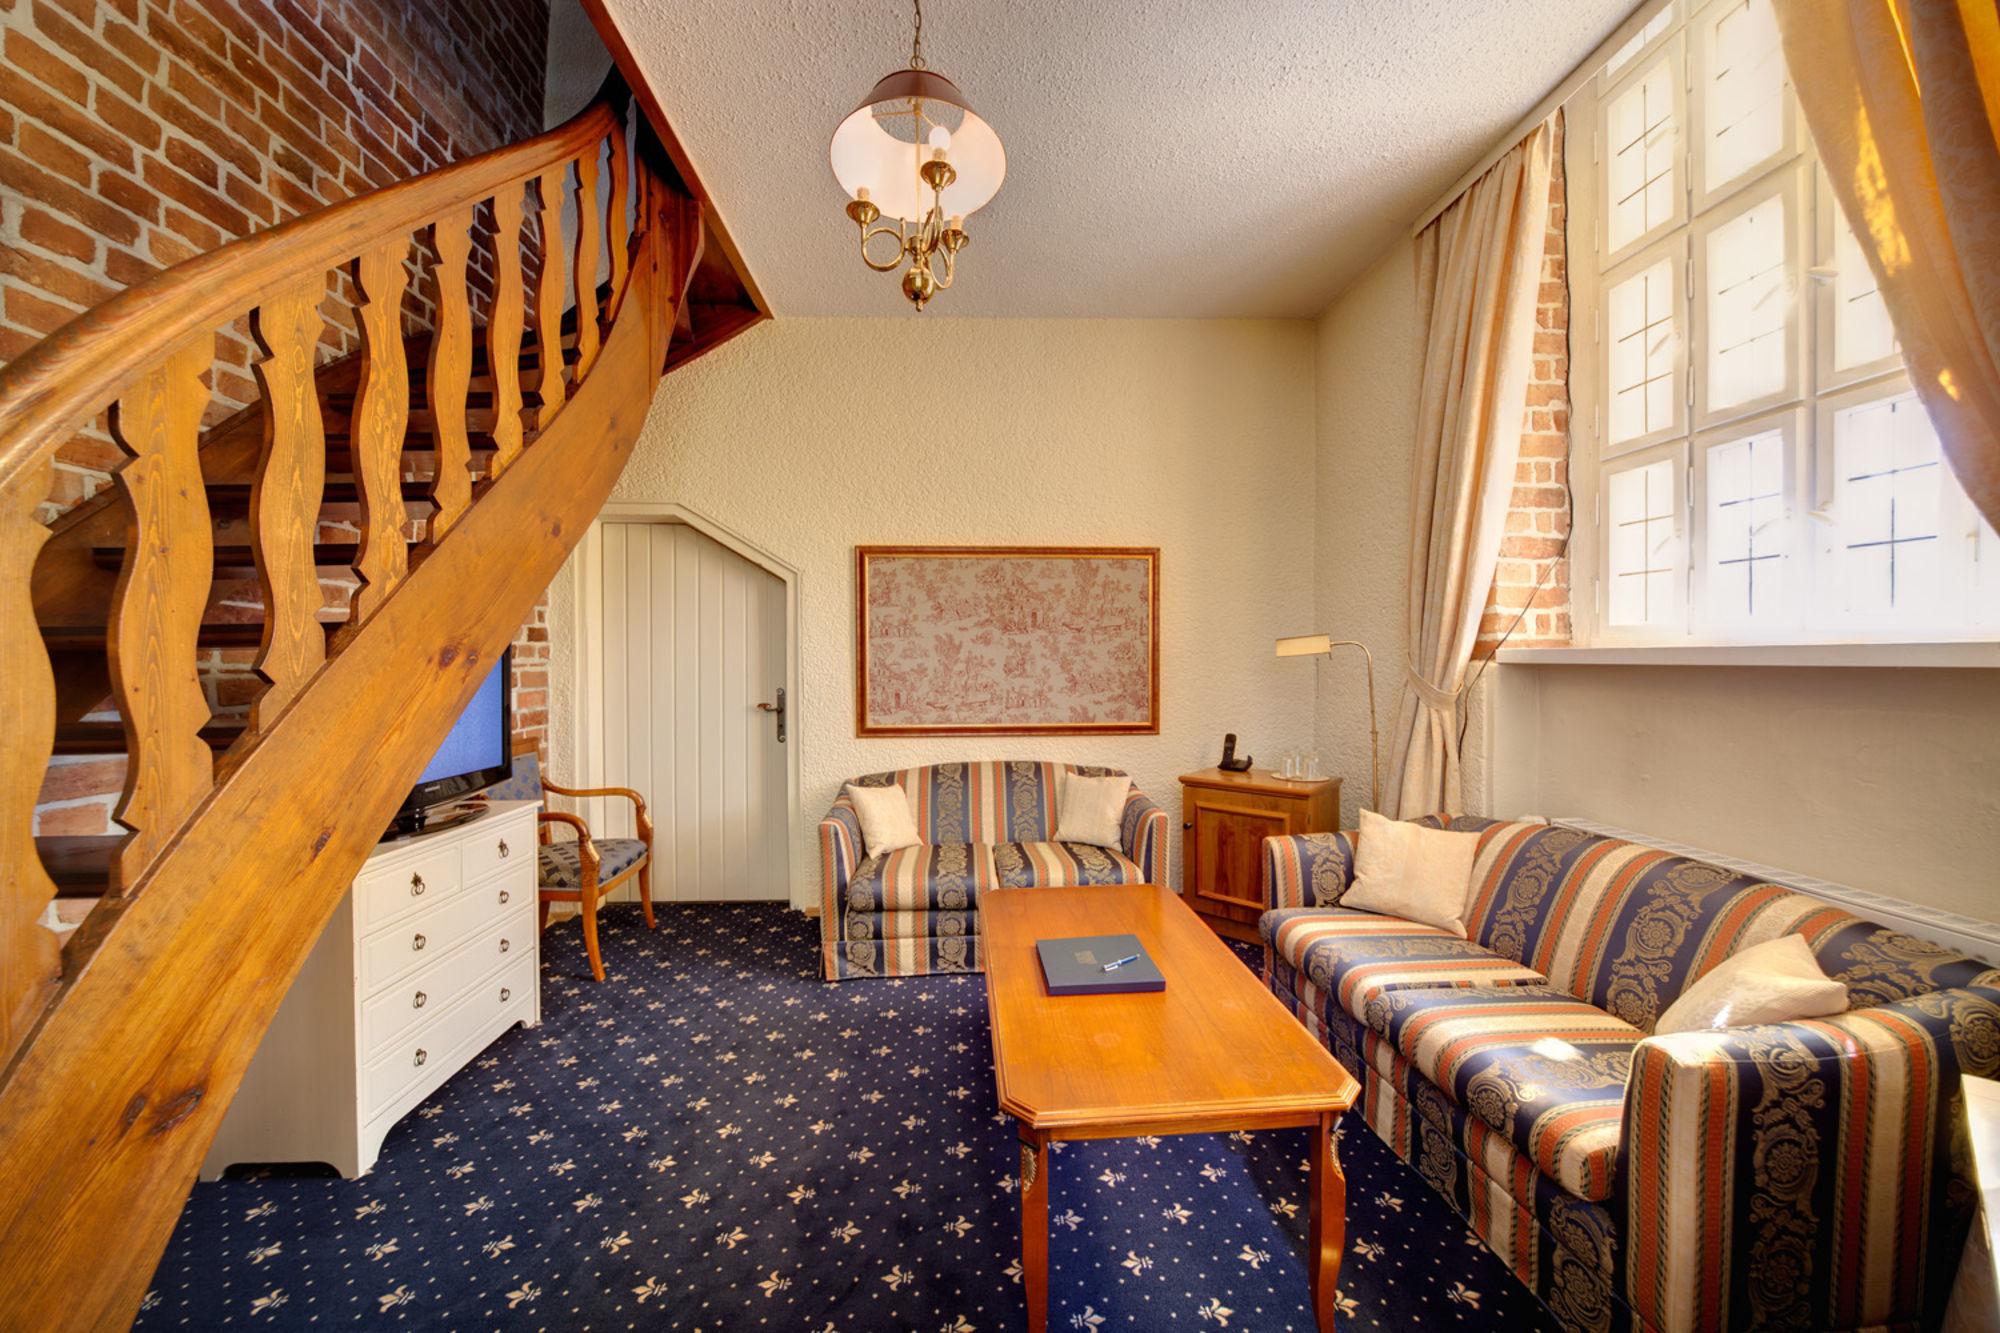 Urlaub Spreewald - Schloss-Hotel - Zimmer - Suite - Schloss Lübbenau im Spreewald